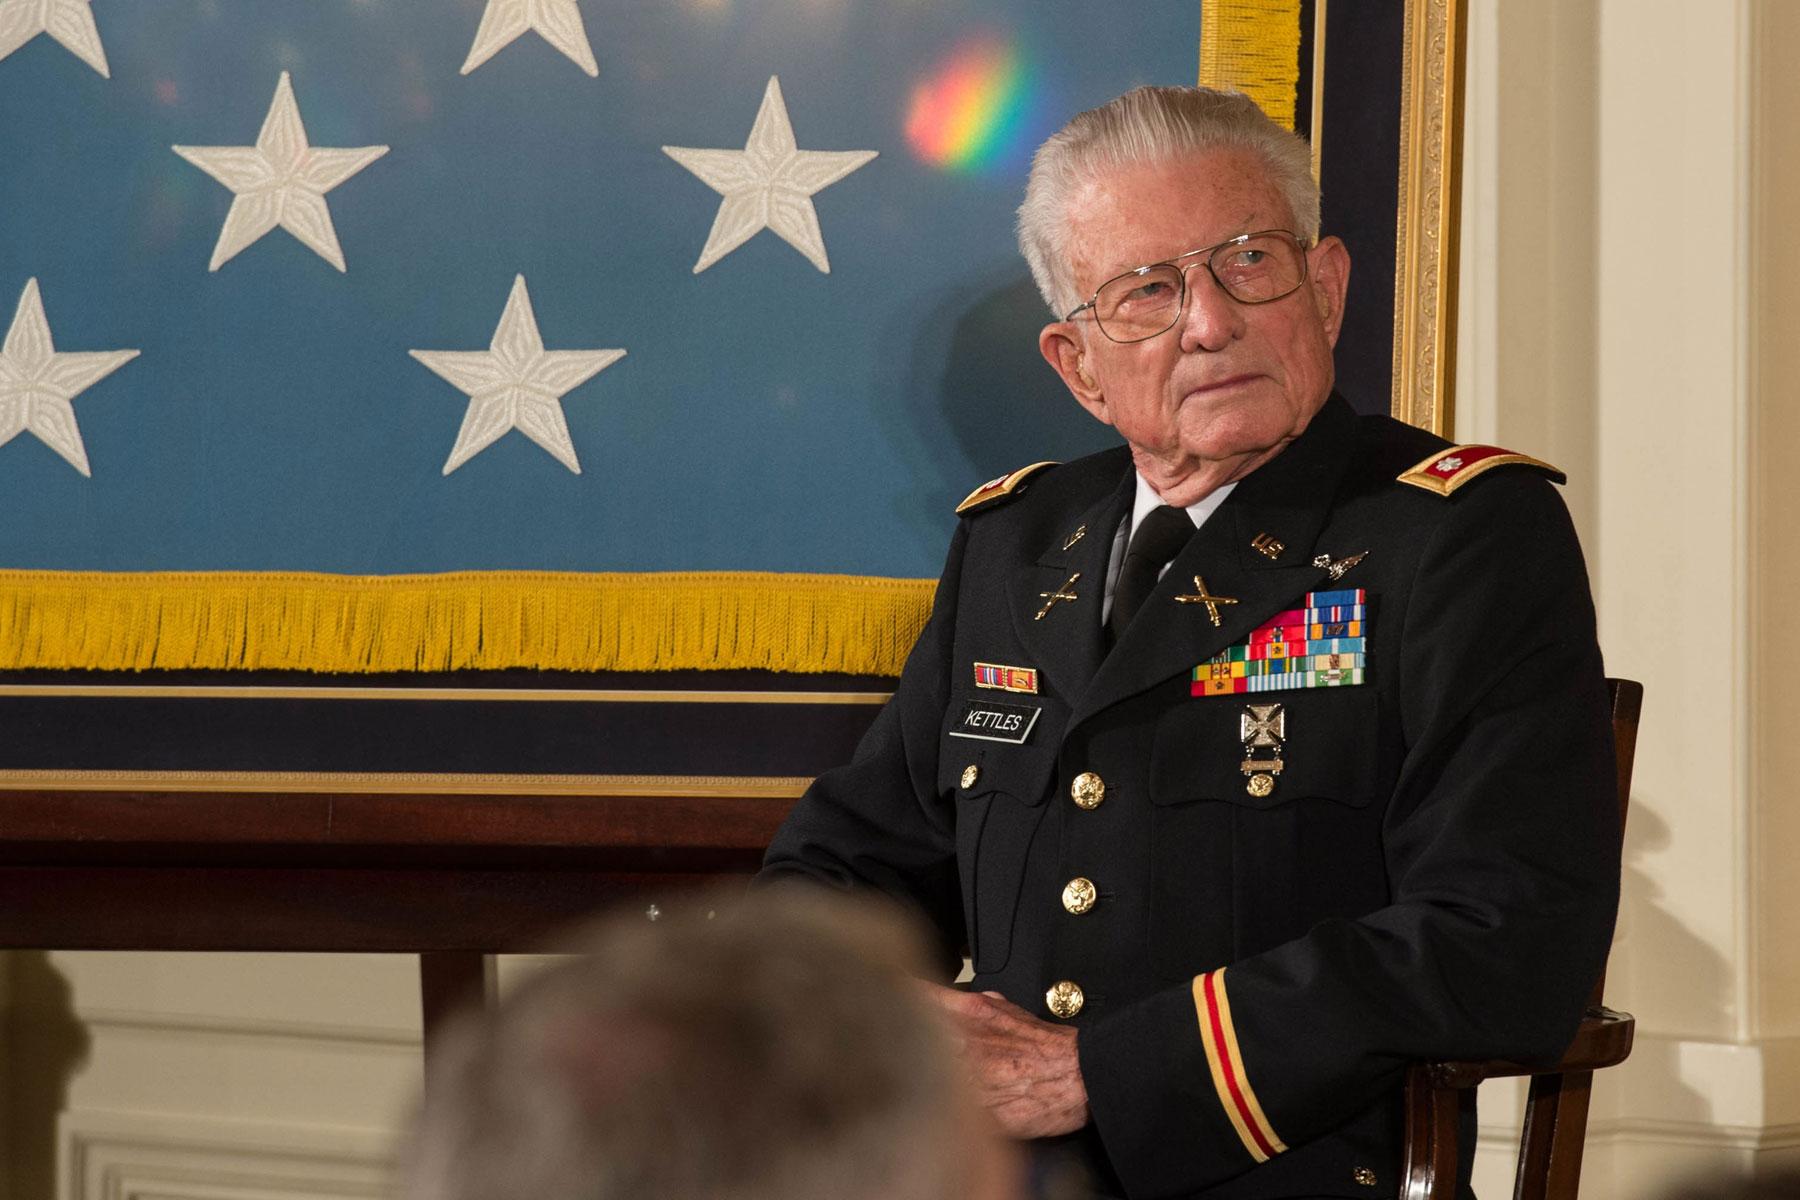 Medal of Honor Recipient Charles Kettles Dies at 89